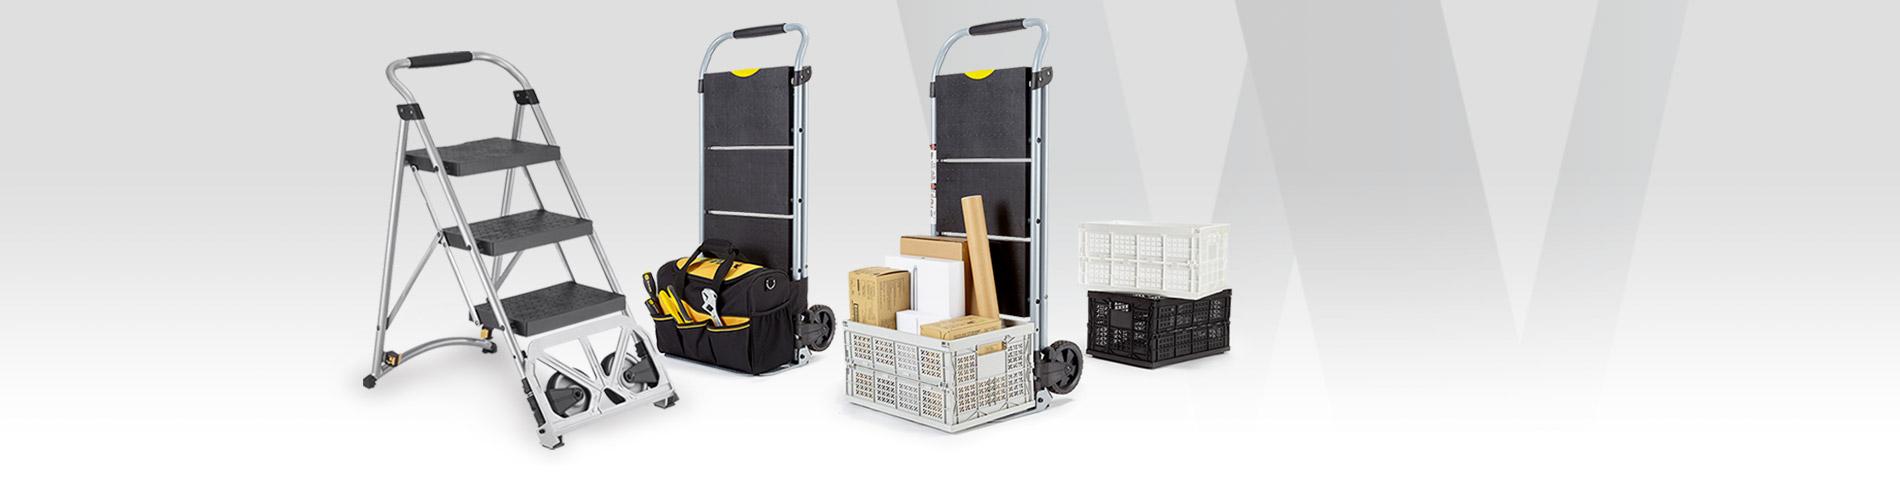 Multifunctioneel Ladder & Kar